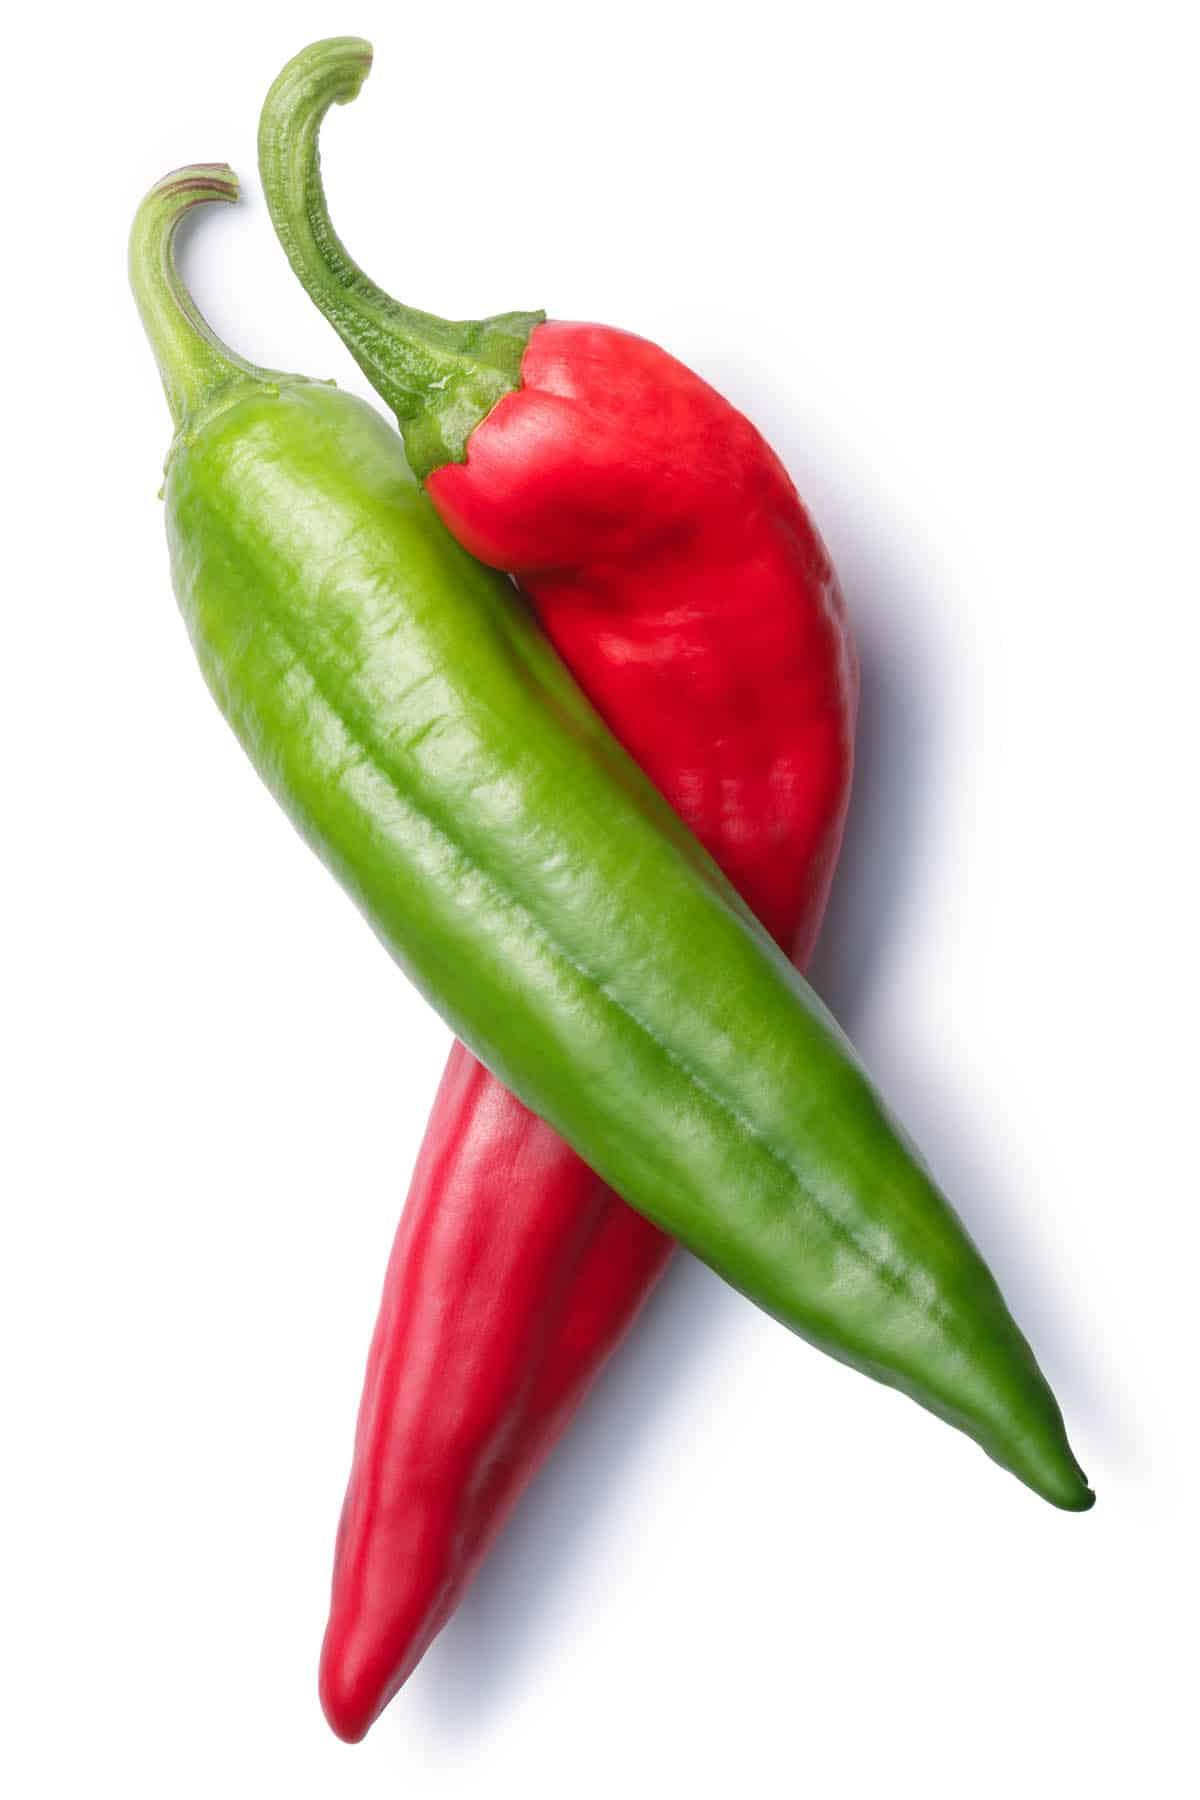 NuMex Joe E. Parker Chili Peppers